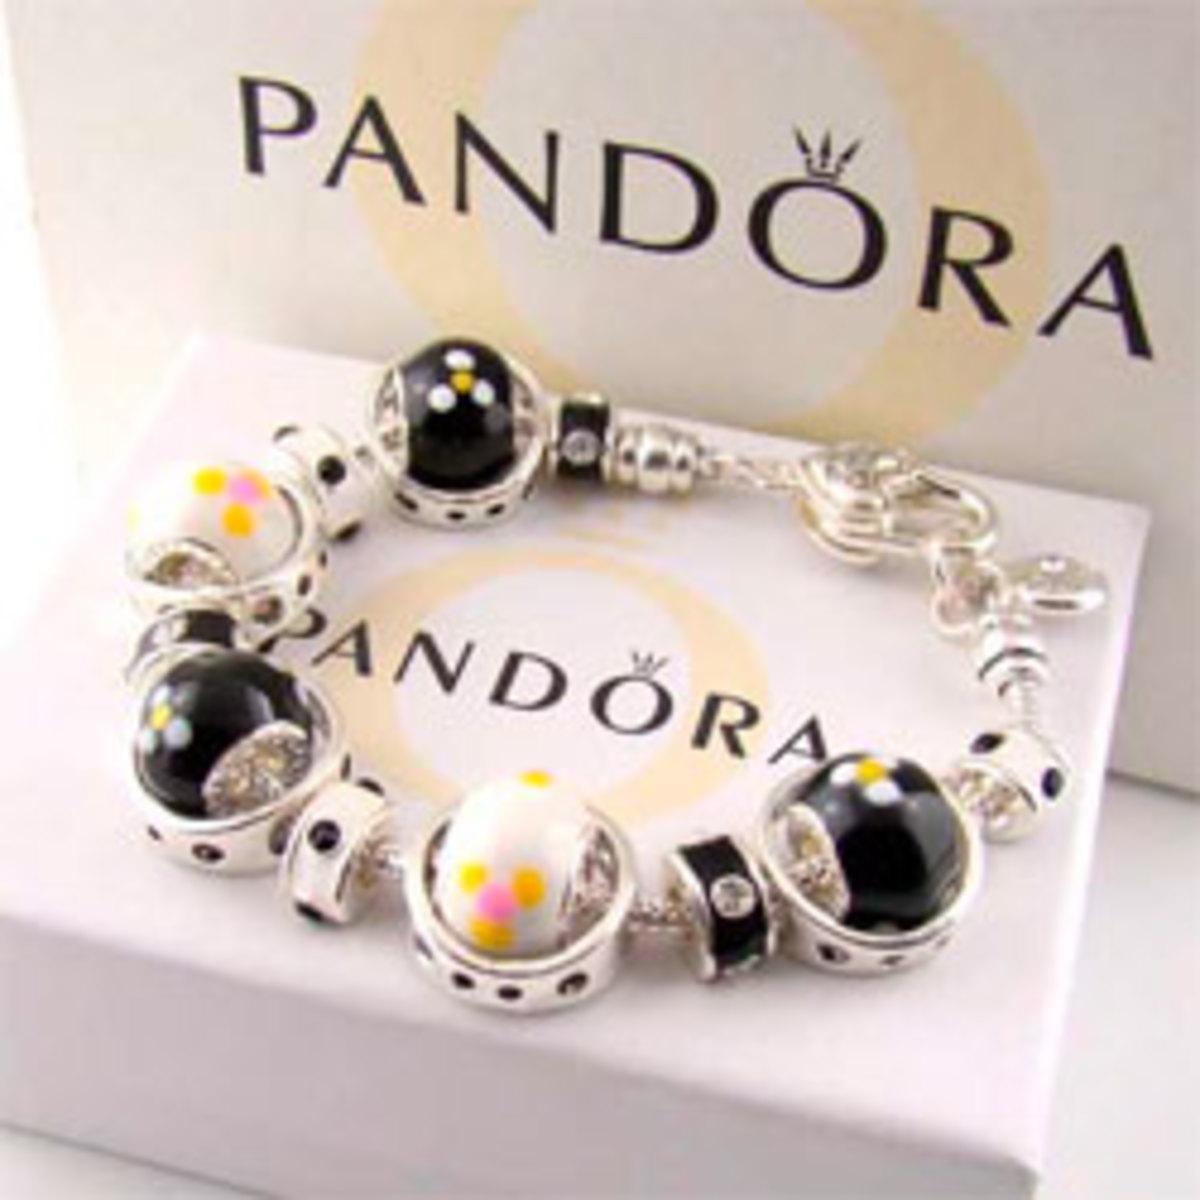 A beautiful, pre-adorned Pandora bracelet for sale.